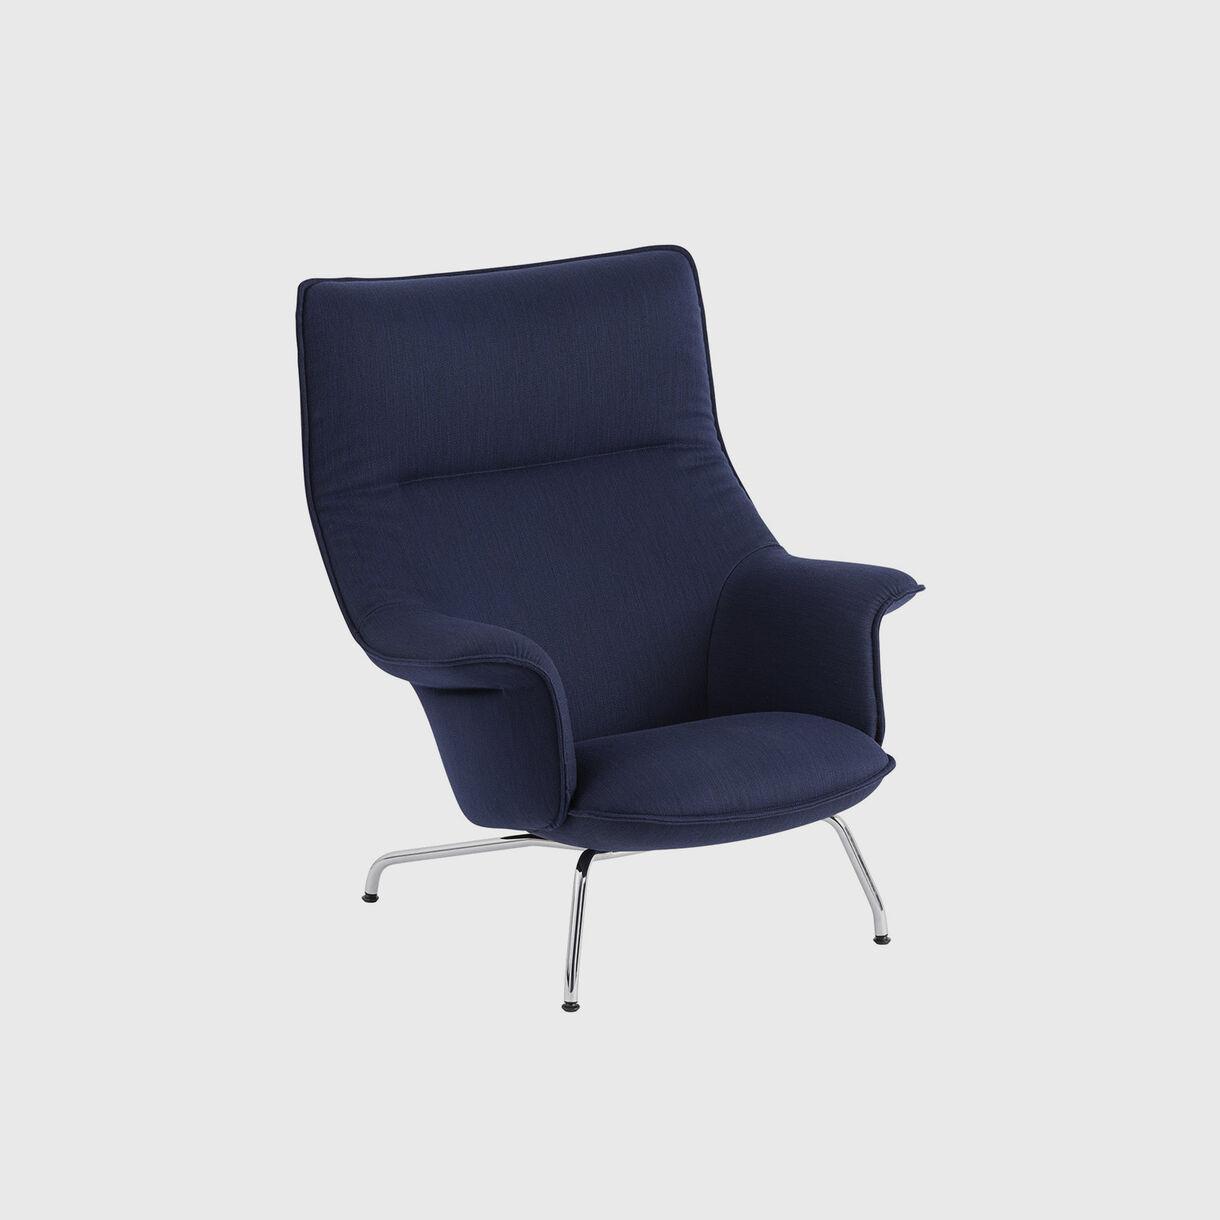 Doze Lounge Chair, Balder 782 & Chrome